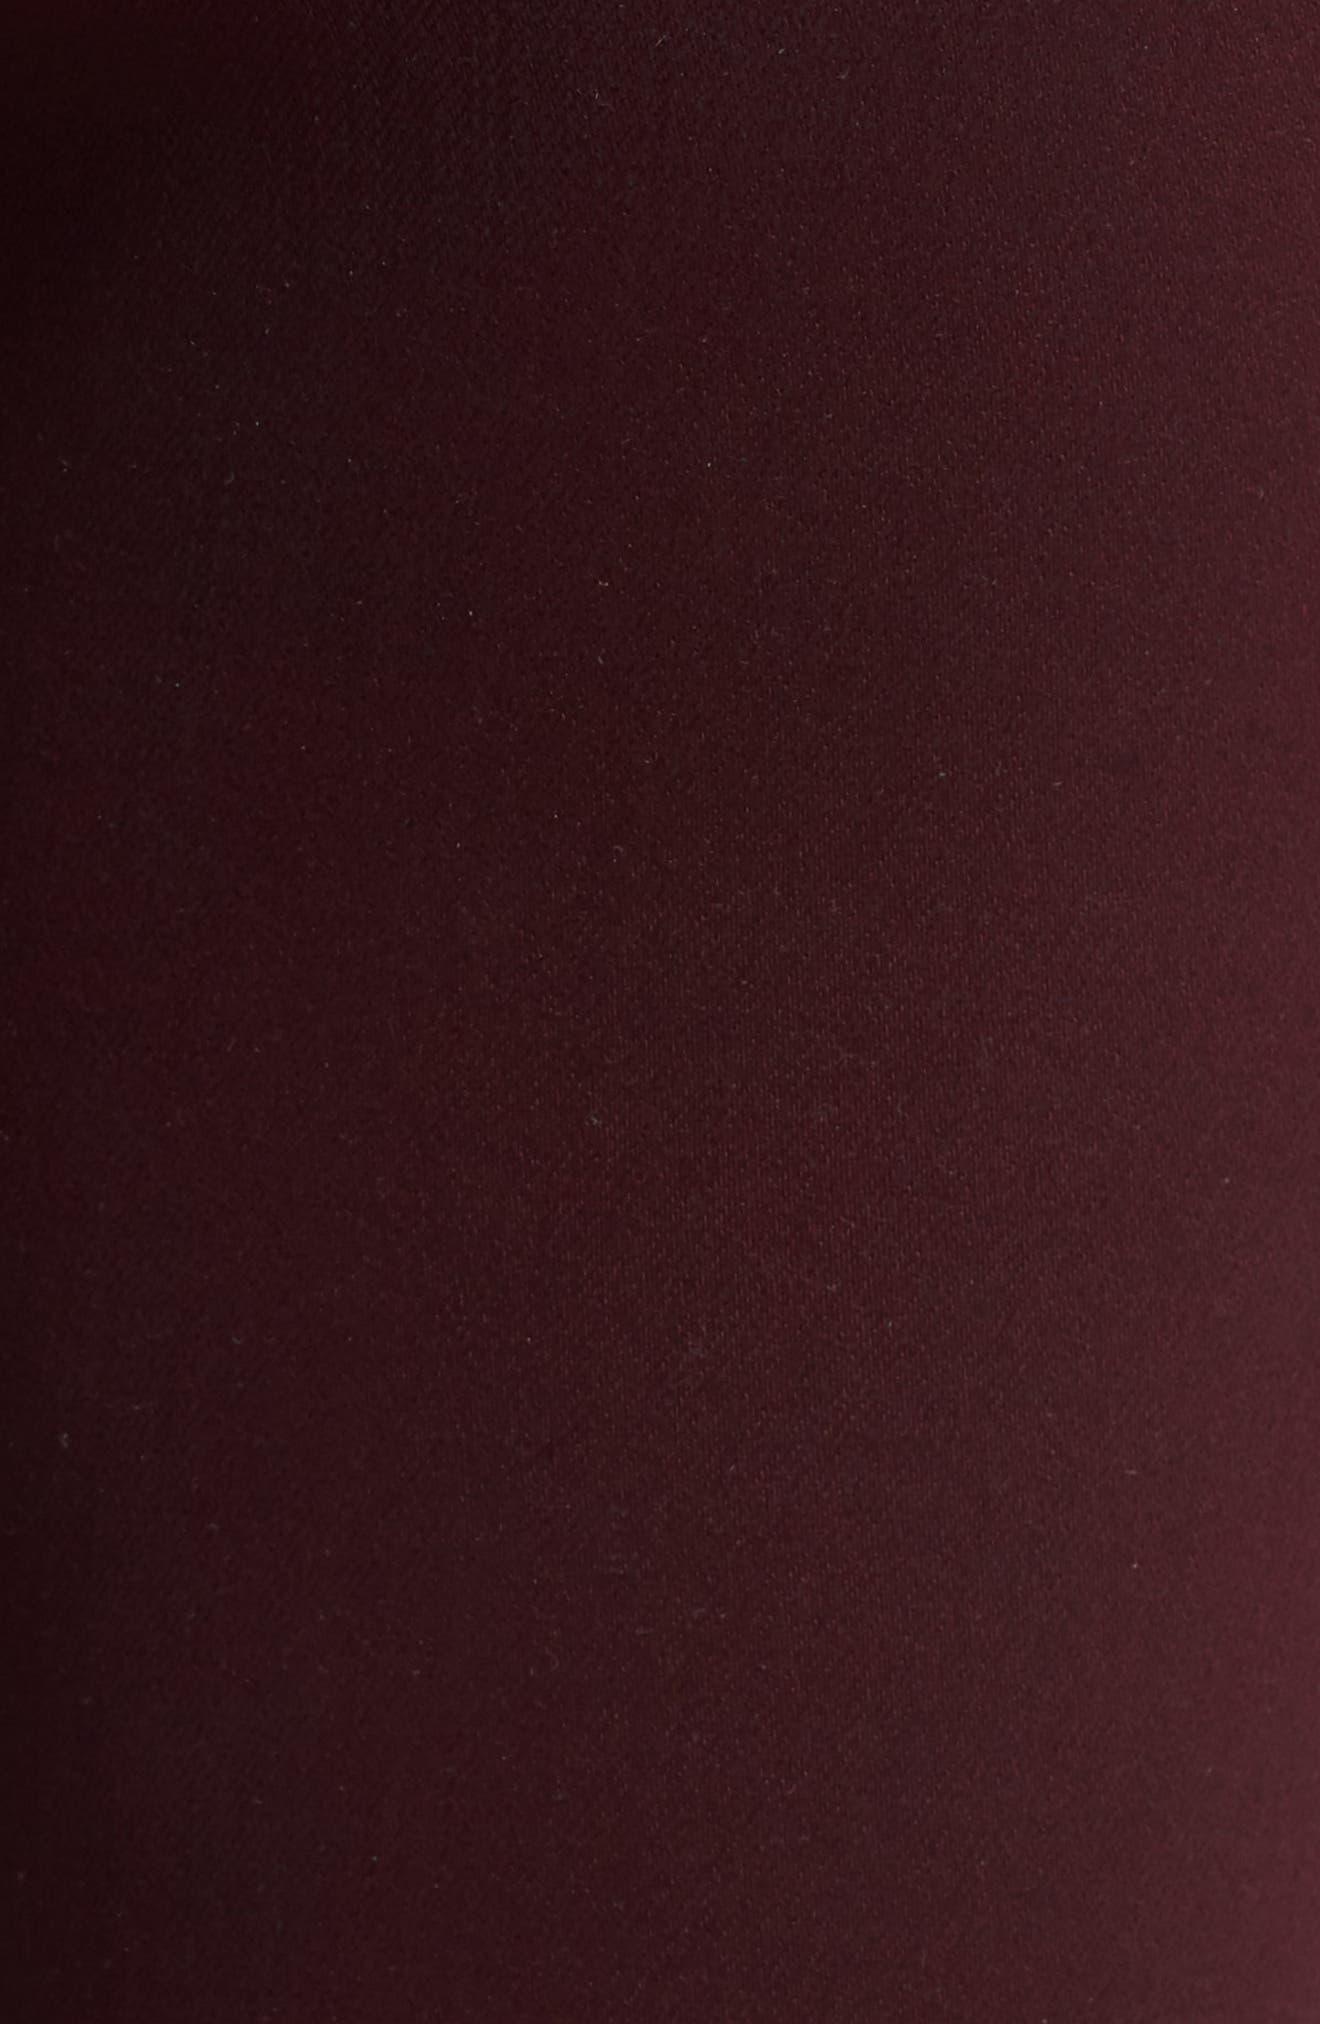 High Waist Coated Skinny Jeans,                             Alternate thumbnail 6, color,                             PORT WAX